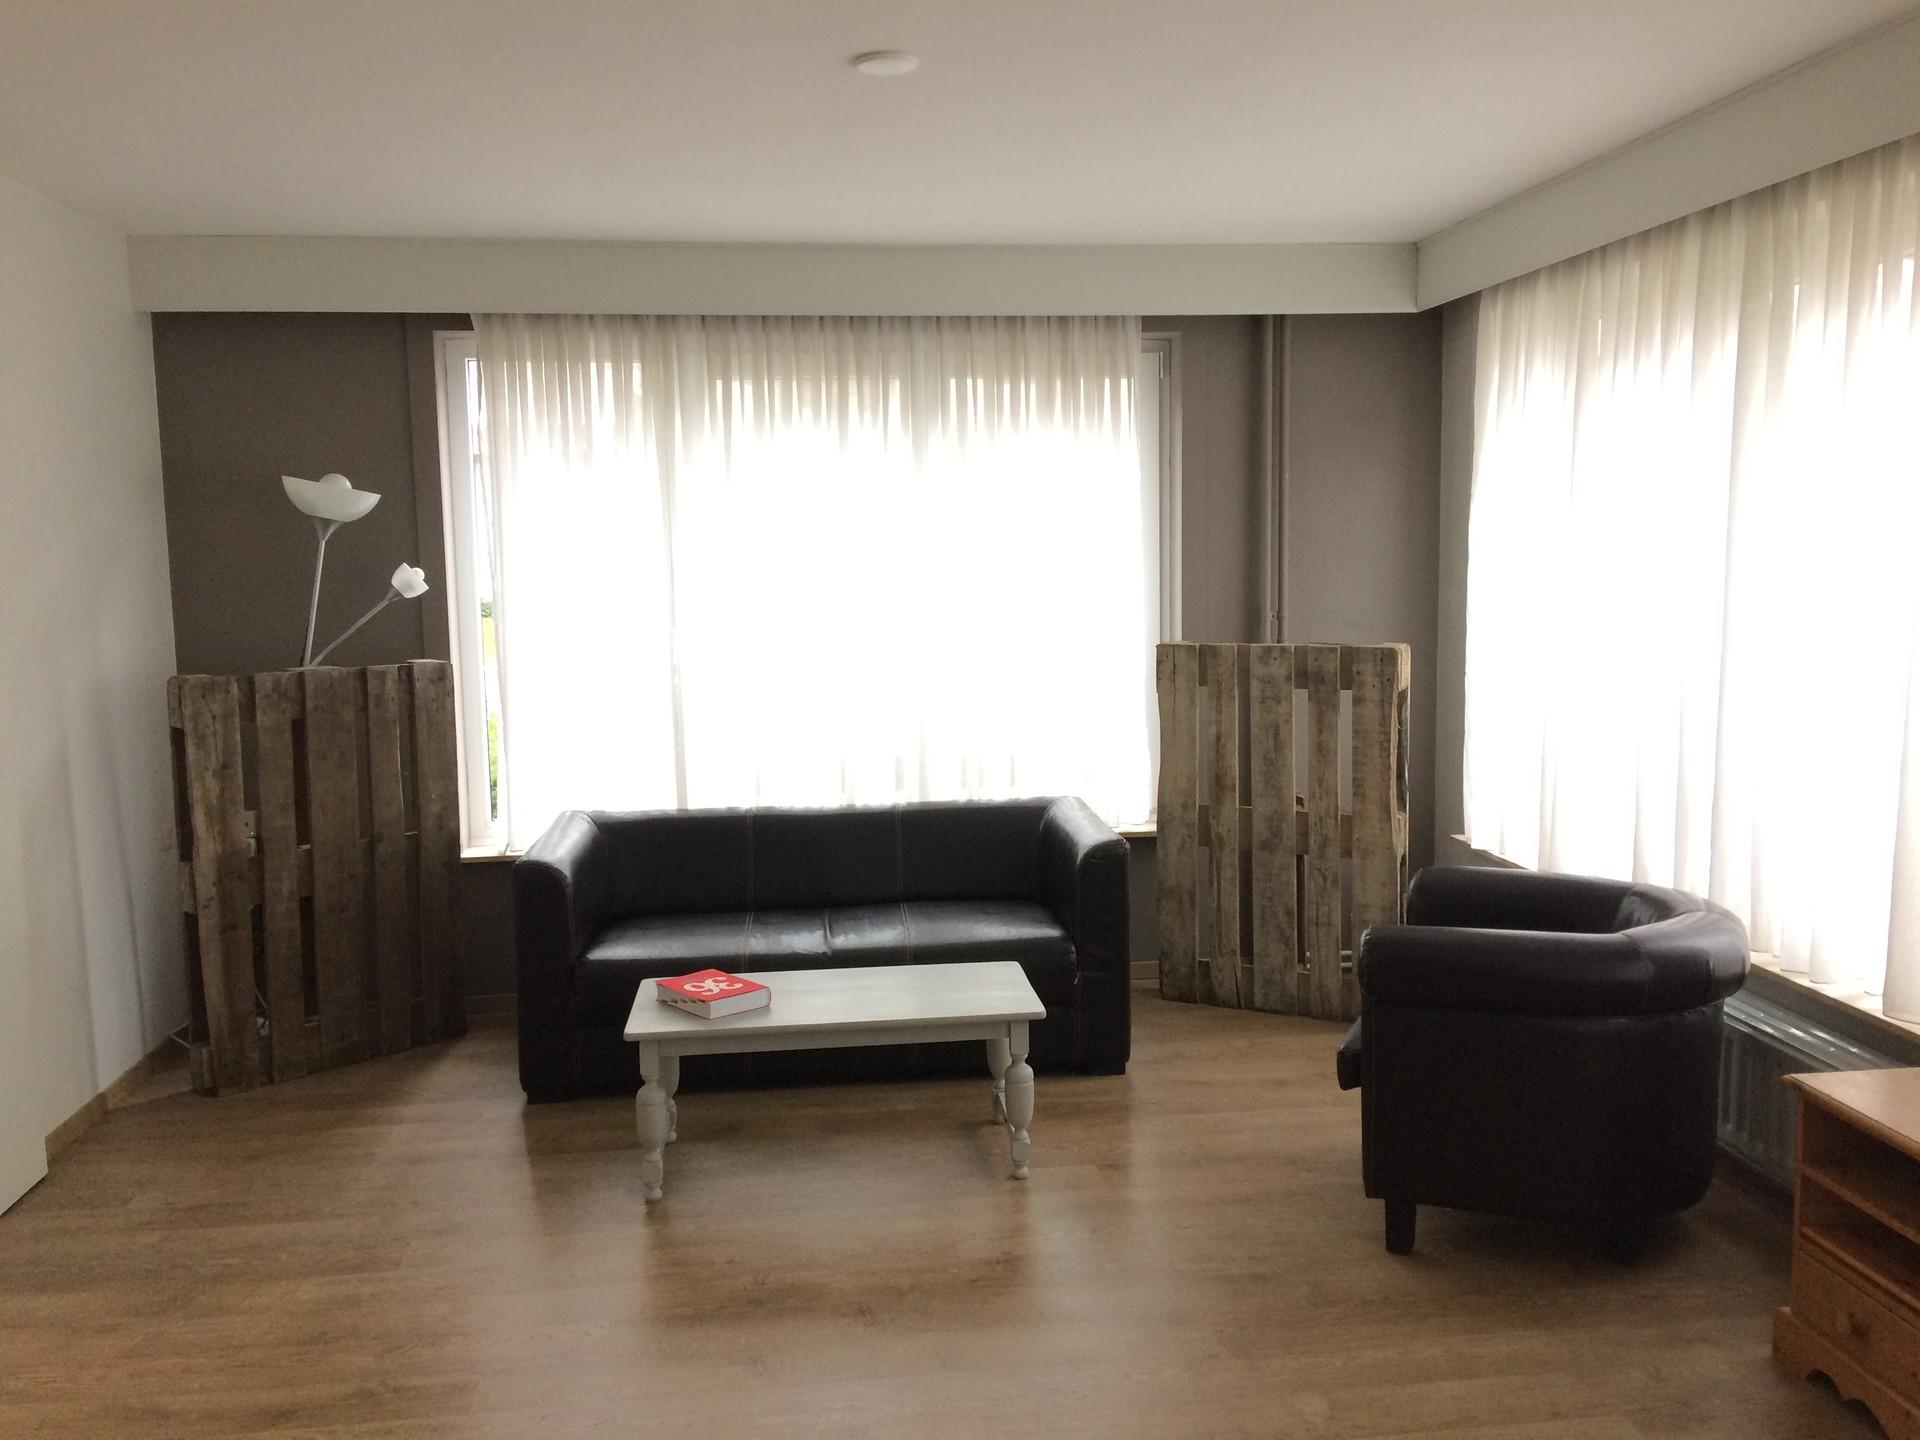 lovely-room-shared-apartment-beautiful-backyard-b15697c60f48a9157acbb1d347c3aa33